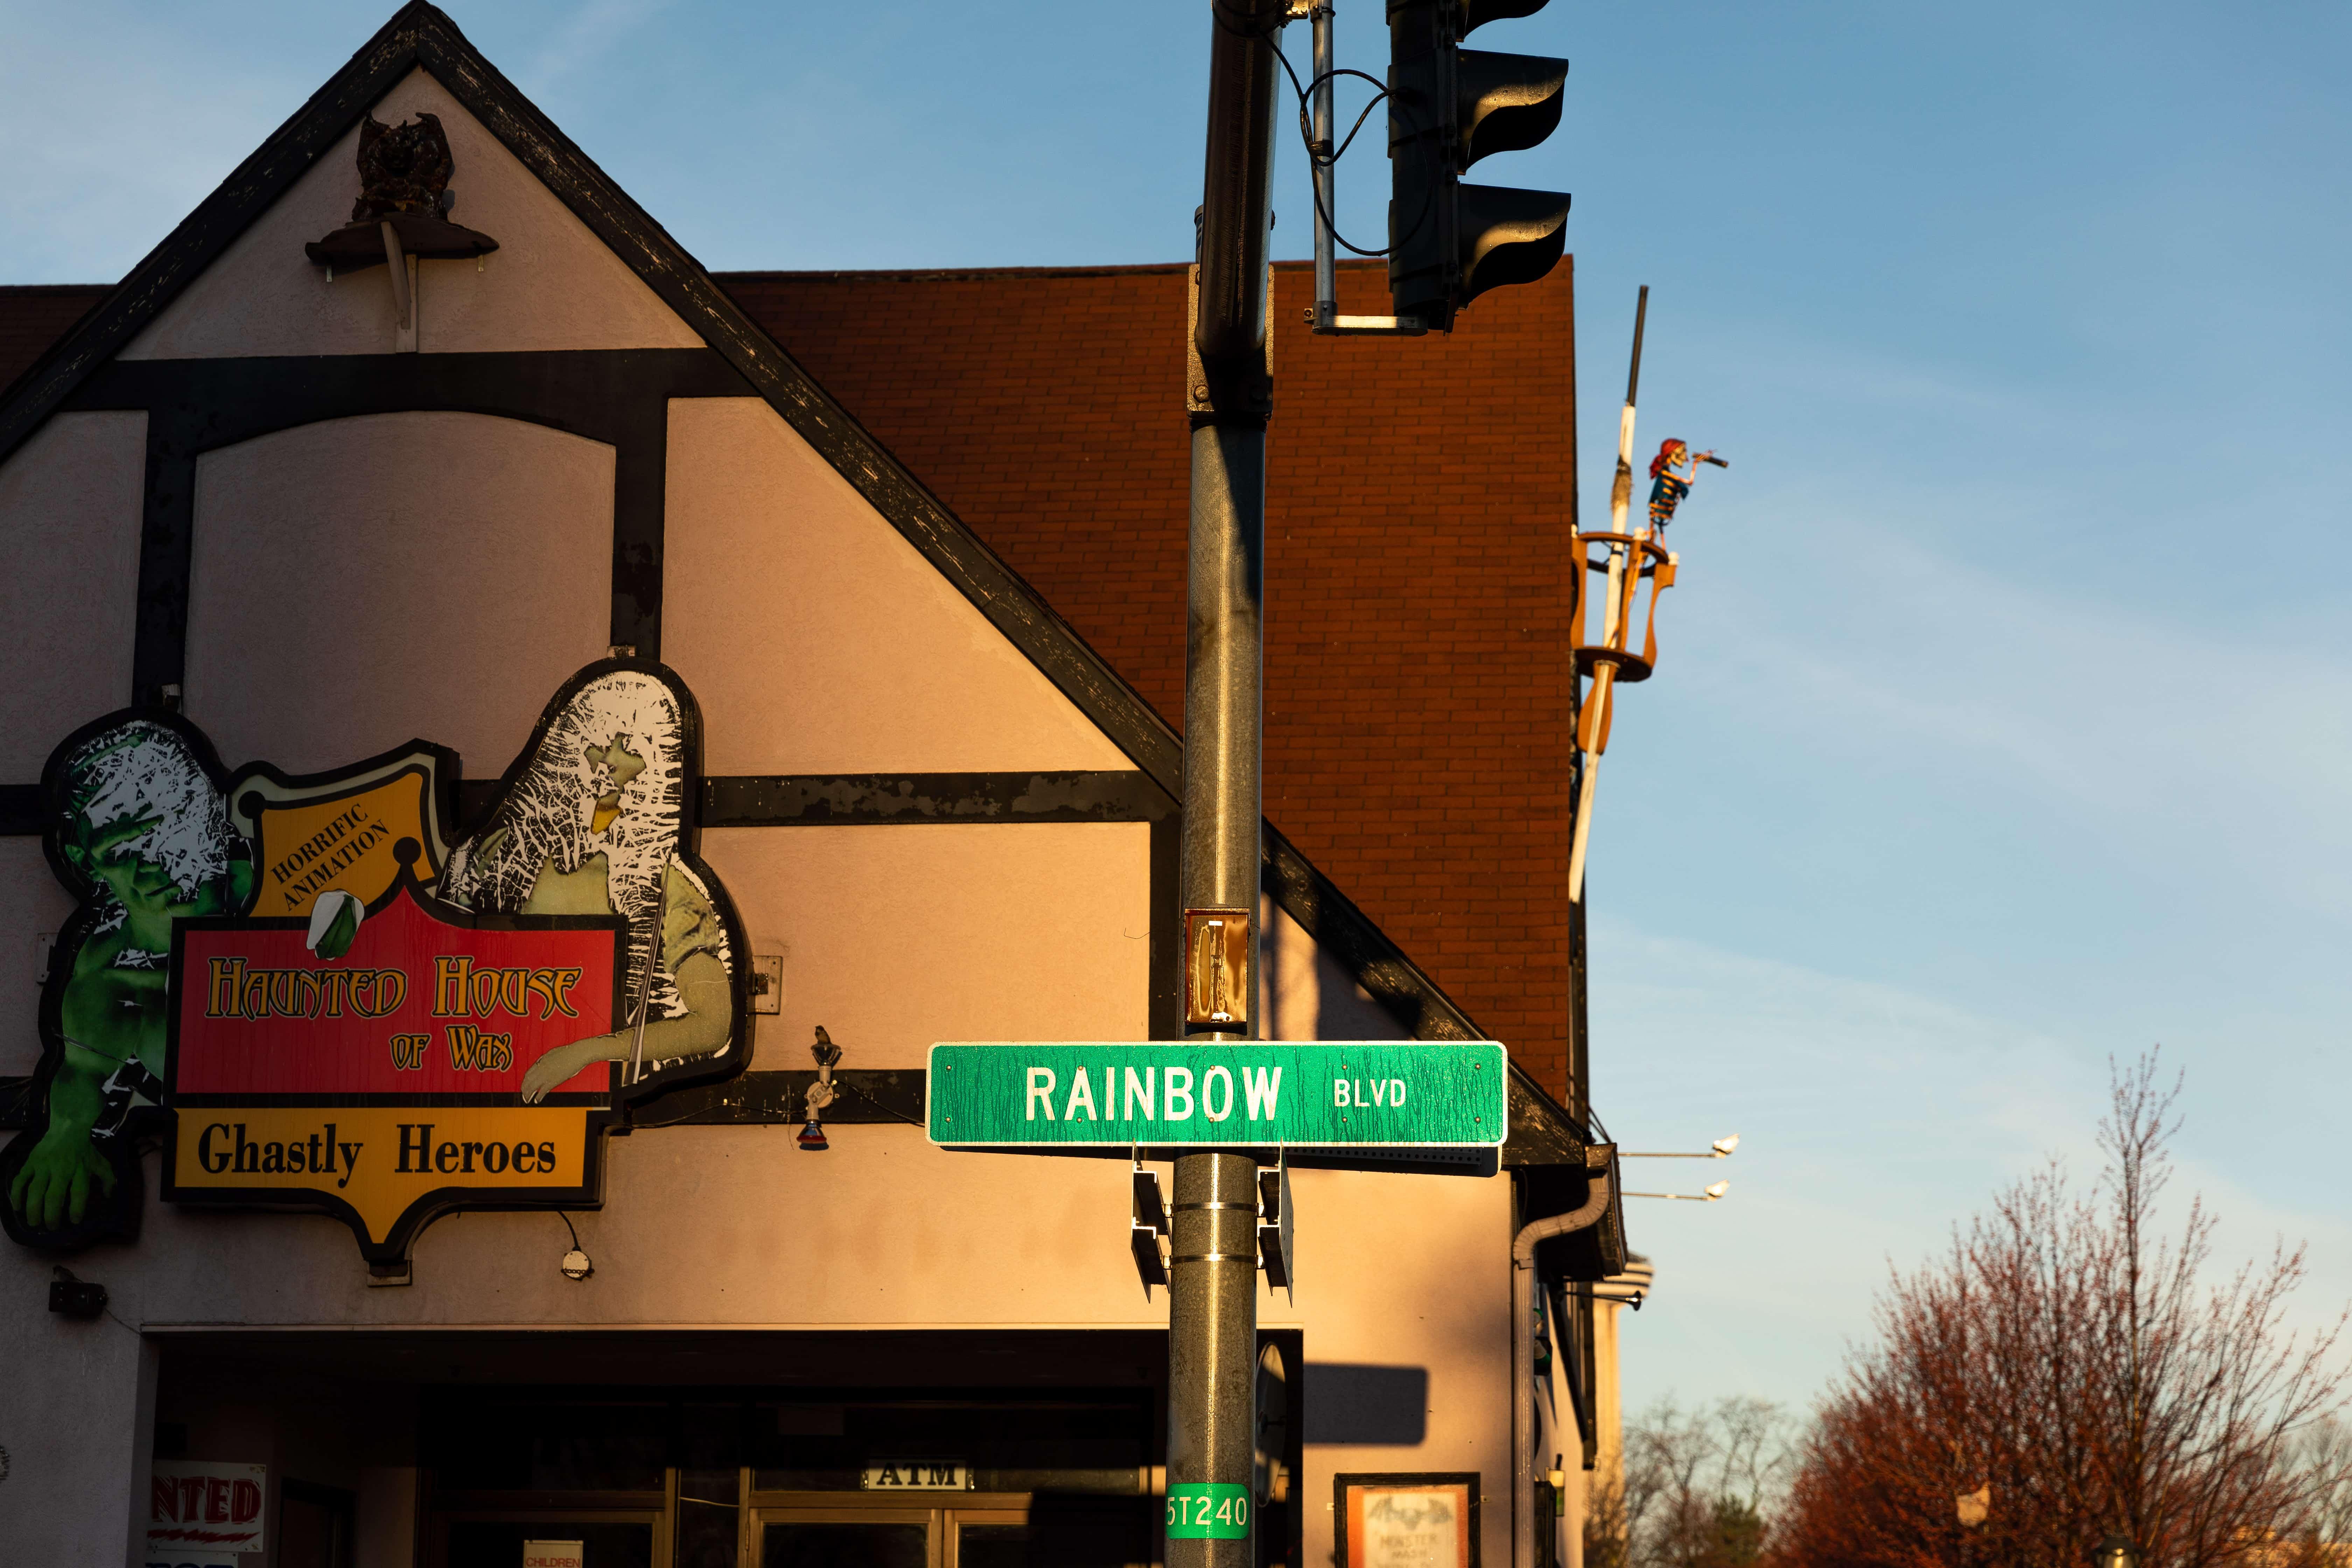 The Haunted House of Wax on Niagara Boulevard, Niagara Falls, NY